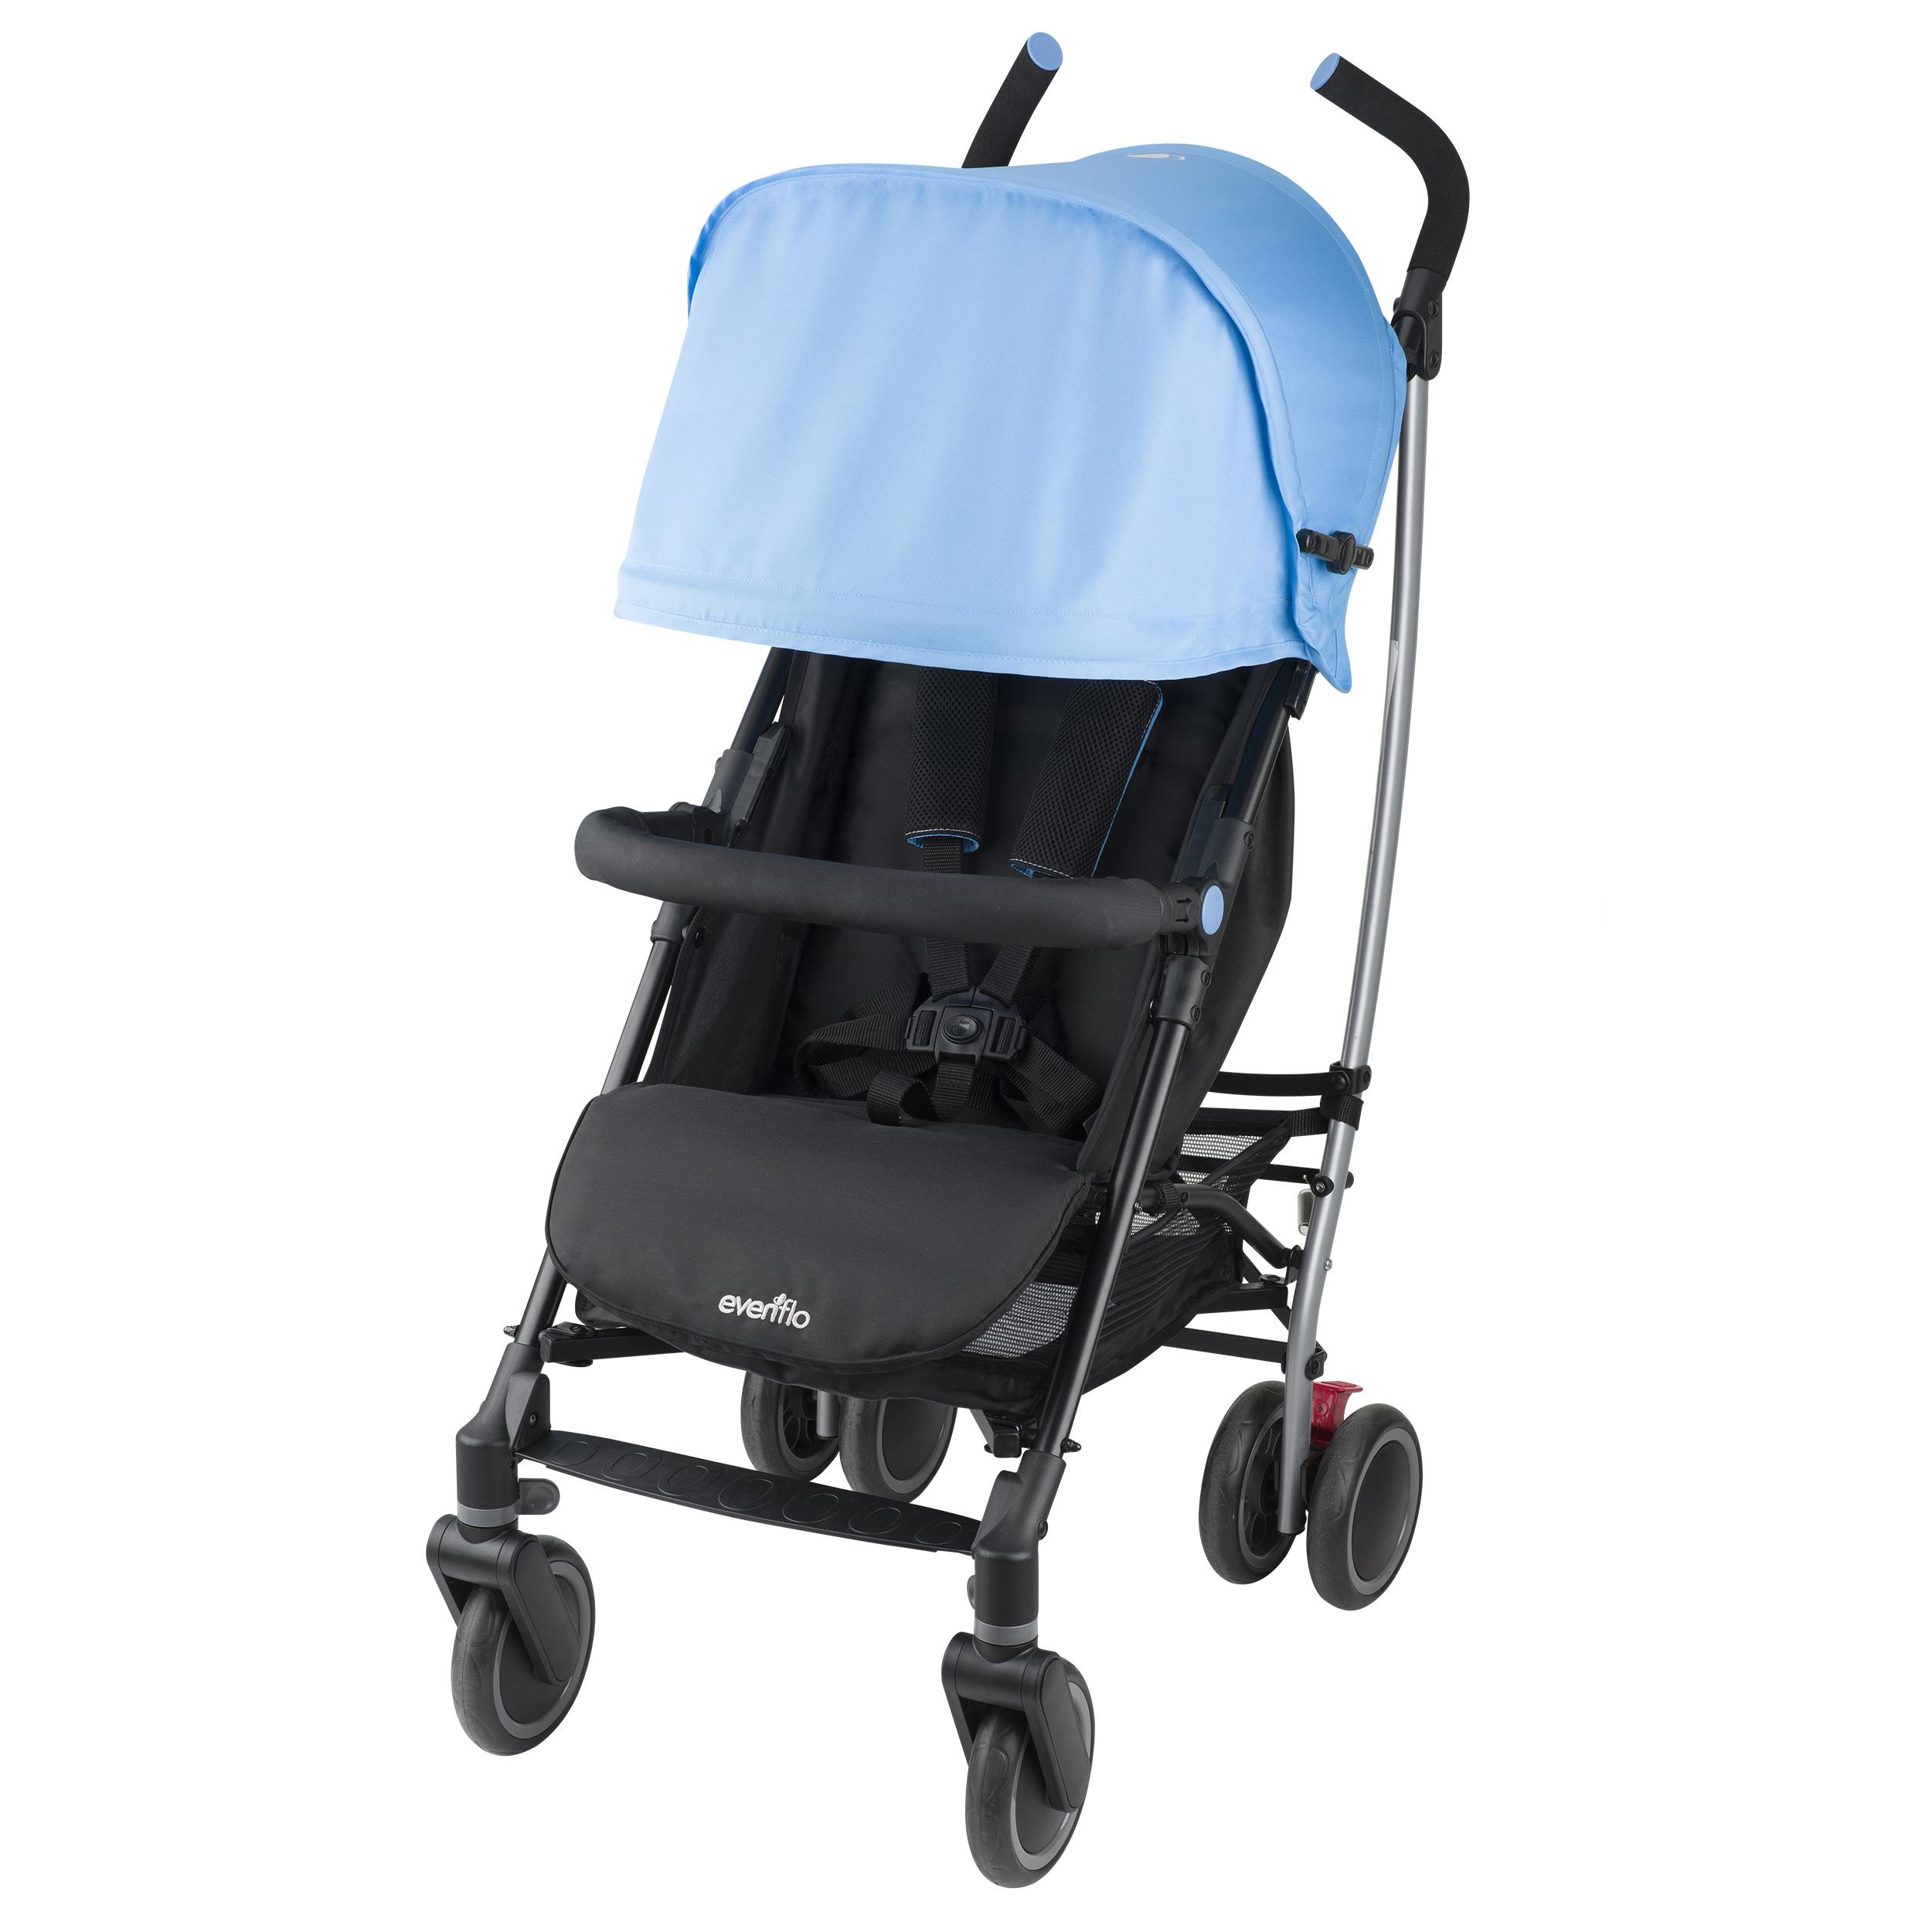 Evenflo Cambridge Stroller  Baby  Baby Gear  Strollers